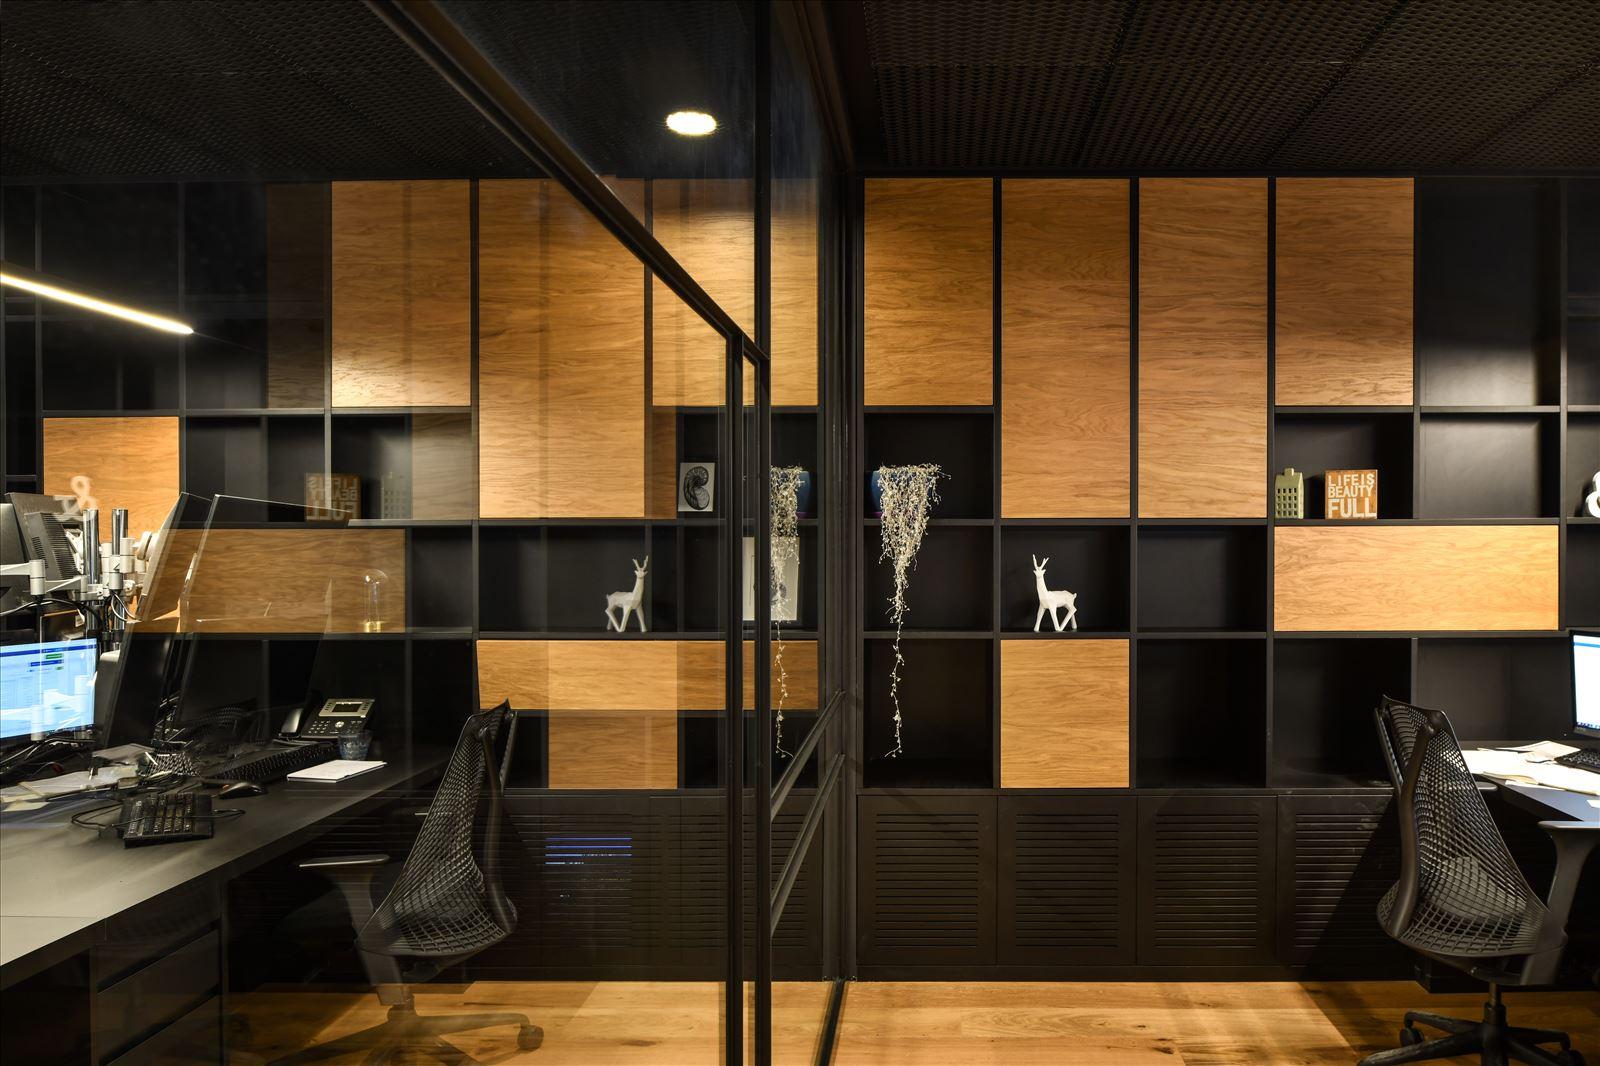 Arbitrage office גוף תאורה מעל שולחן העובדה בתכנון דורי קמחי